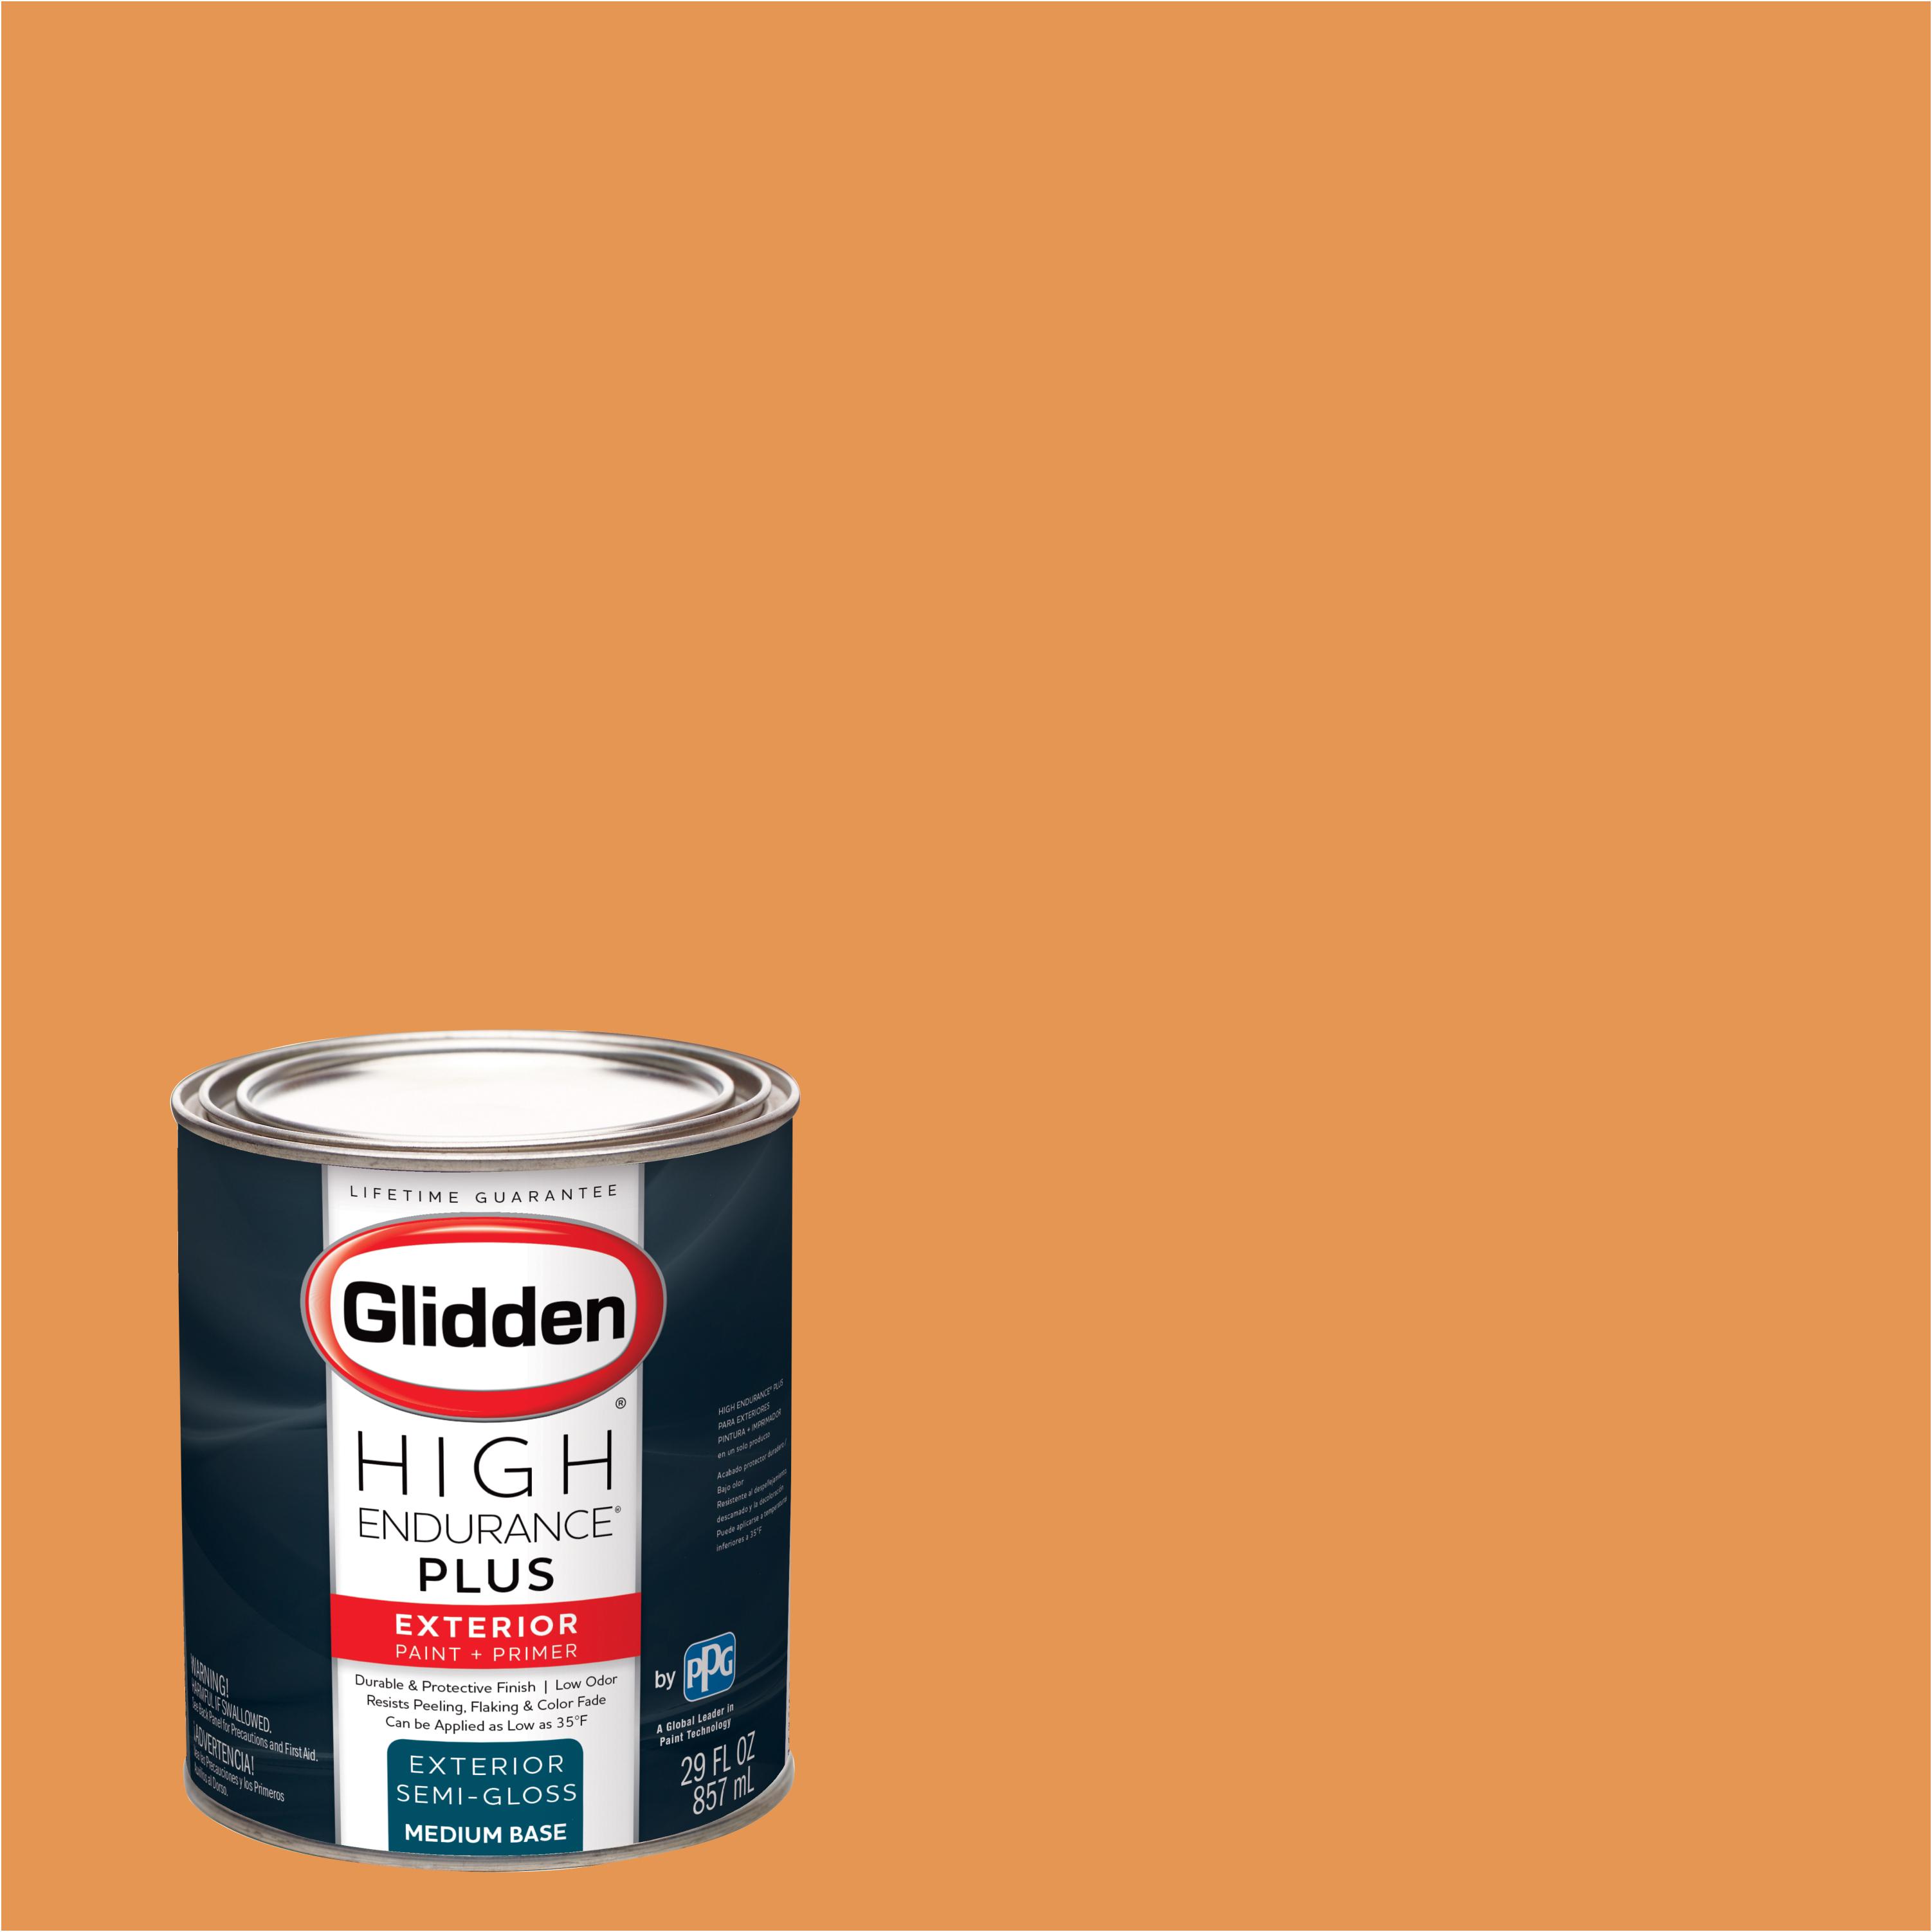 Glidden High Endurance Plus Exterior Paint and Primer, Orange Slice, #83YR 44/540